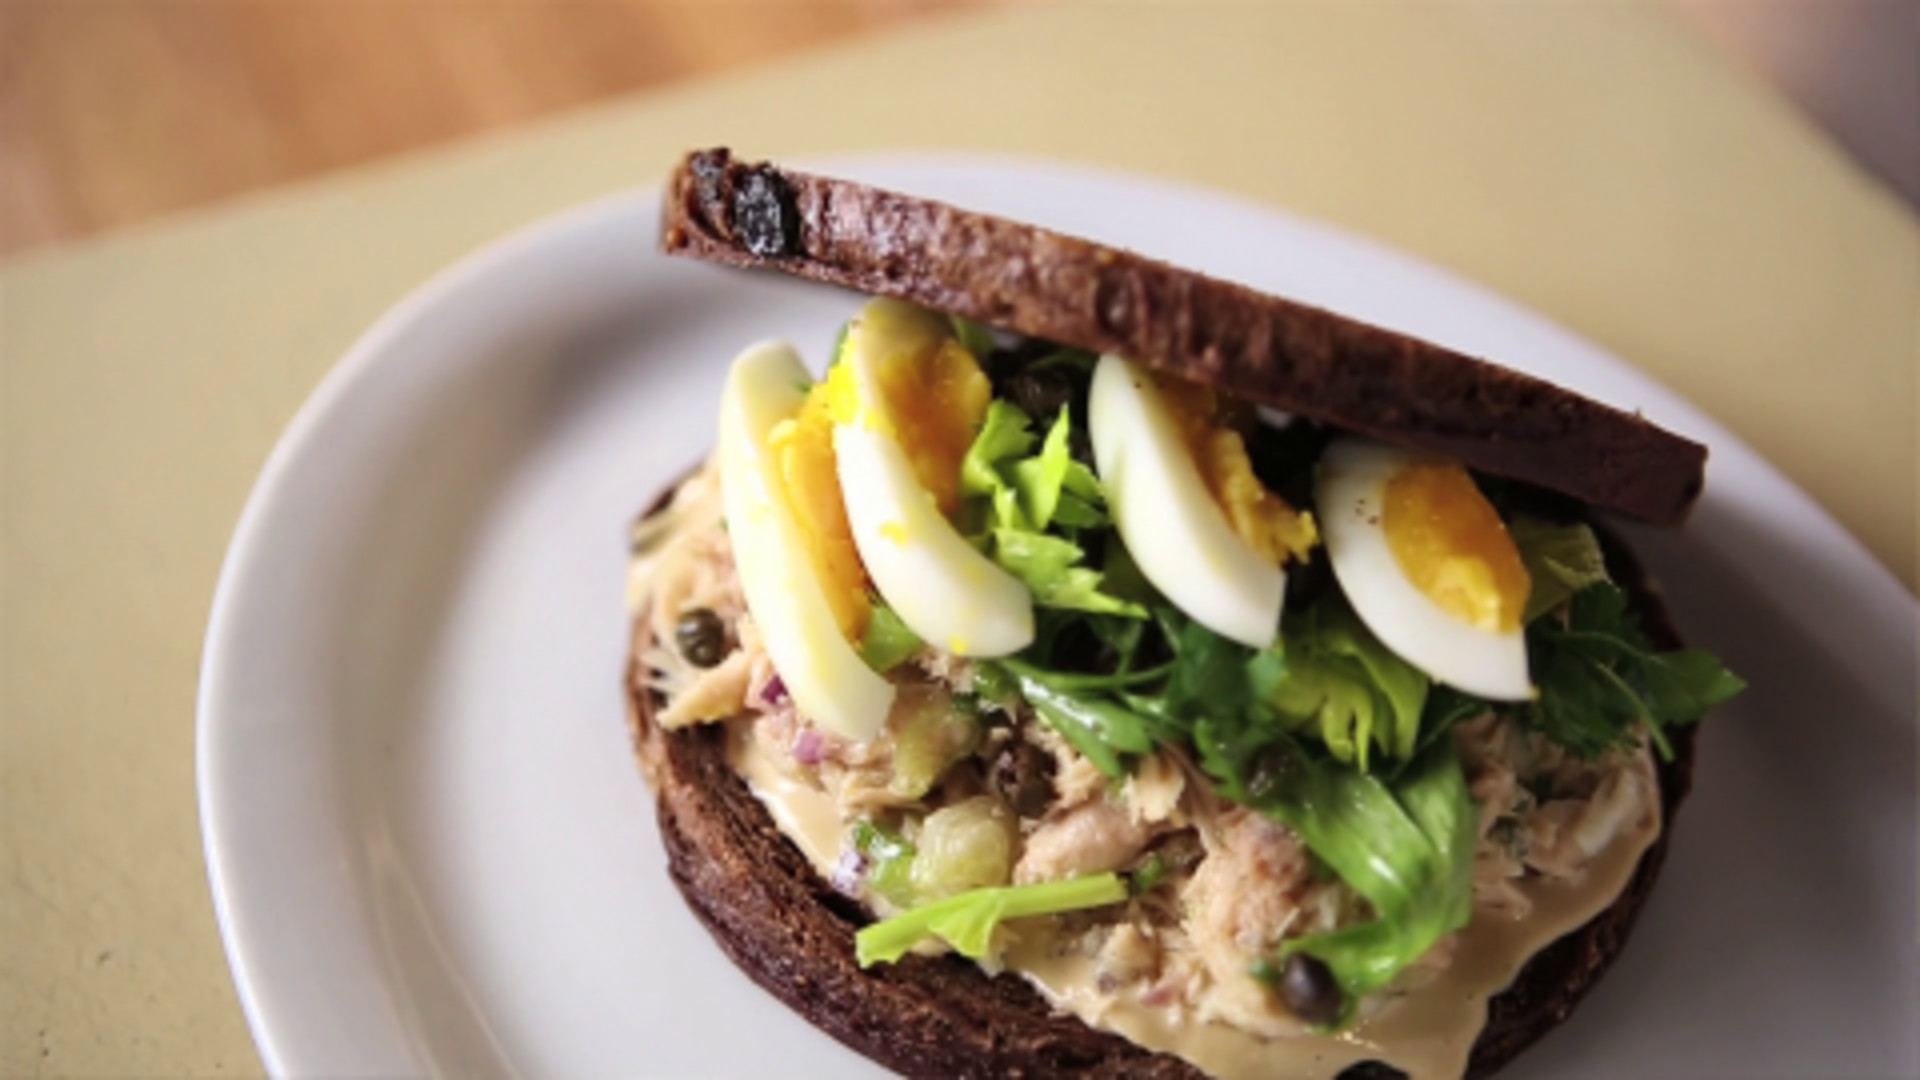 Learn to Make a Sandwich Like Mile End Sandwich in NYC